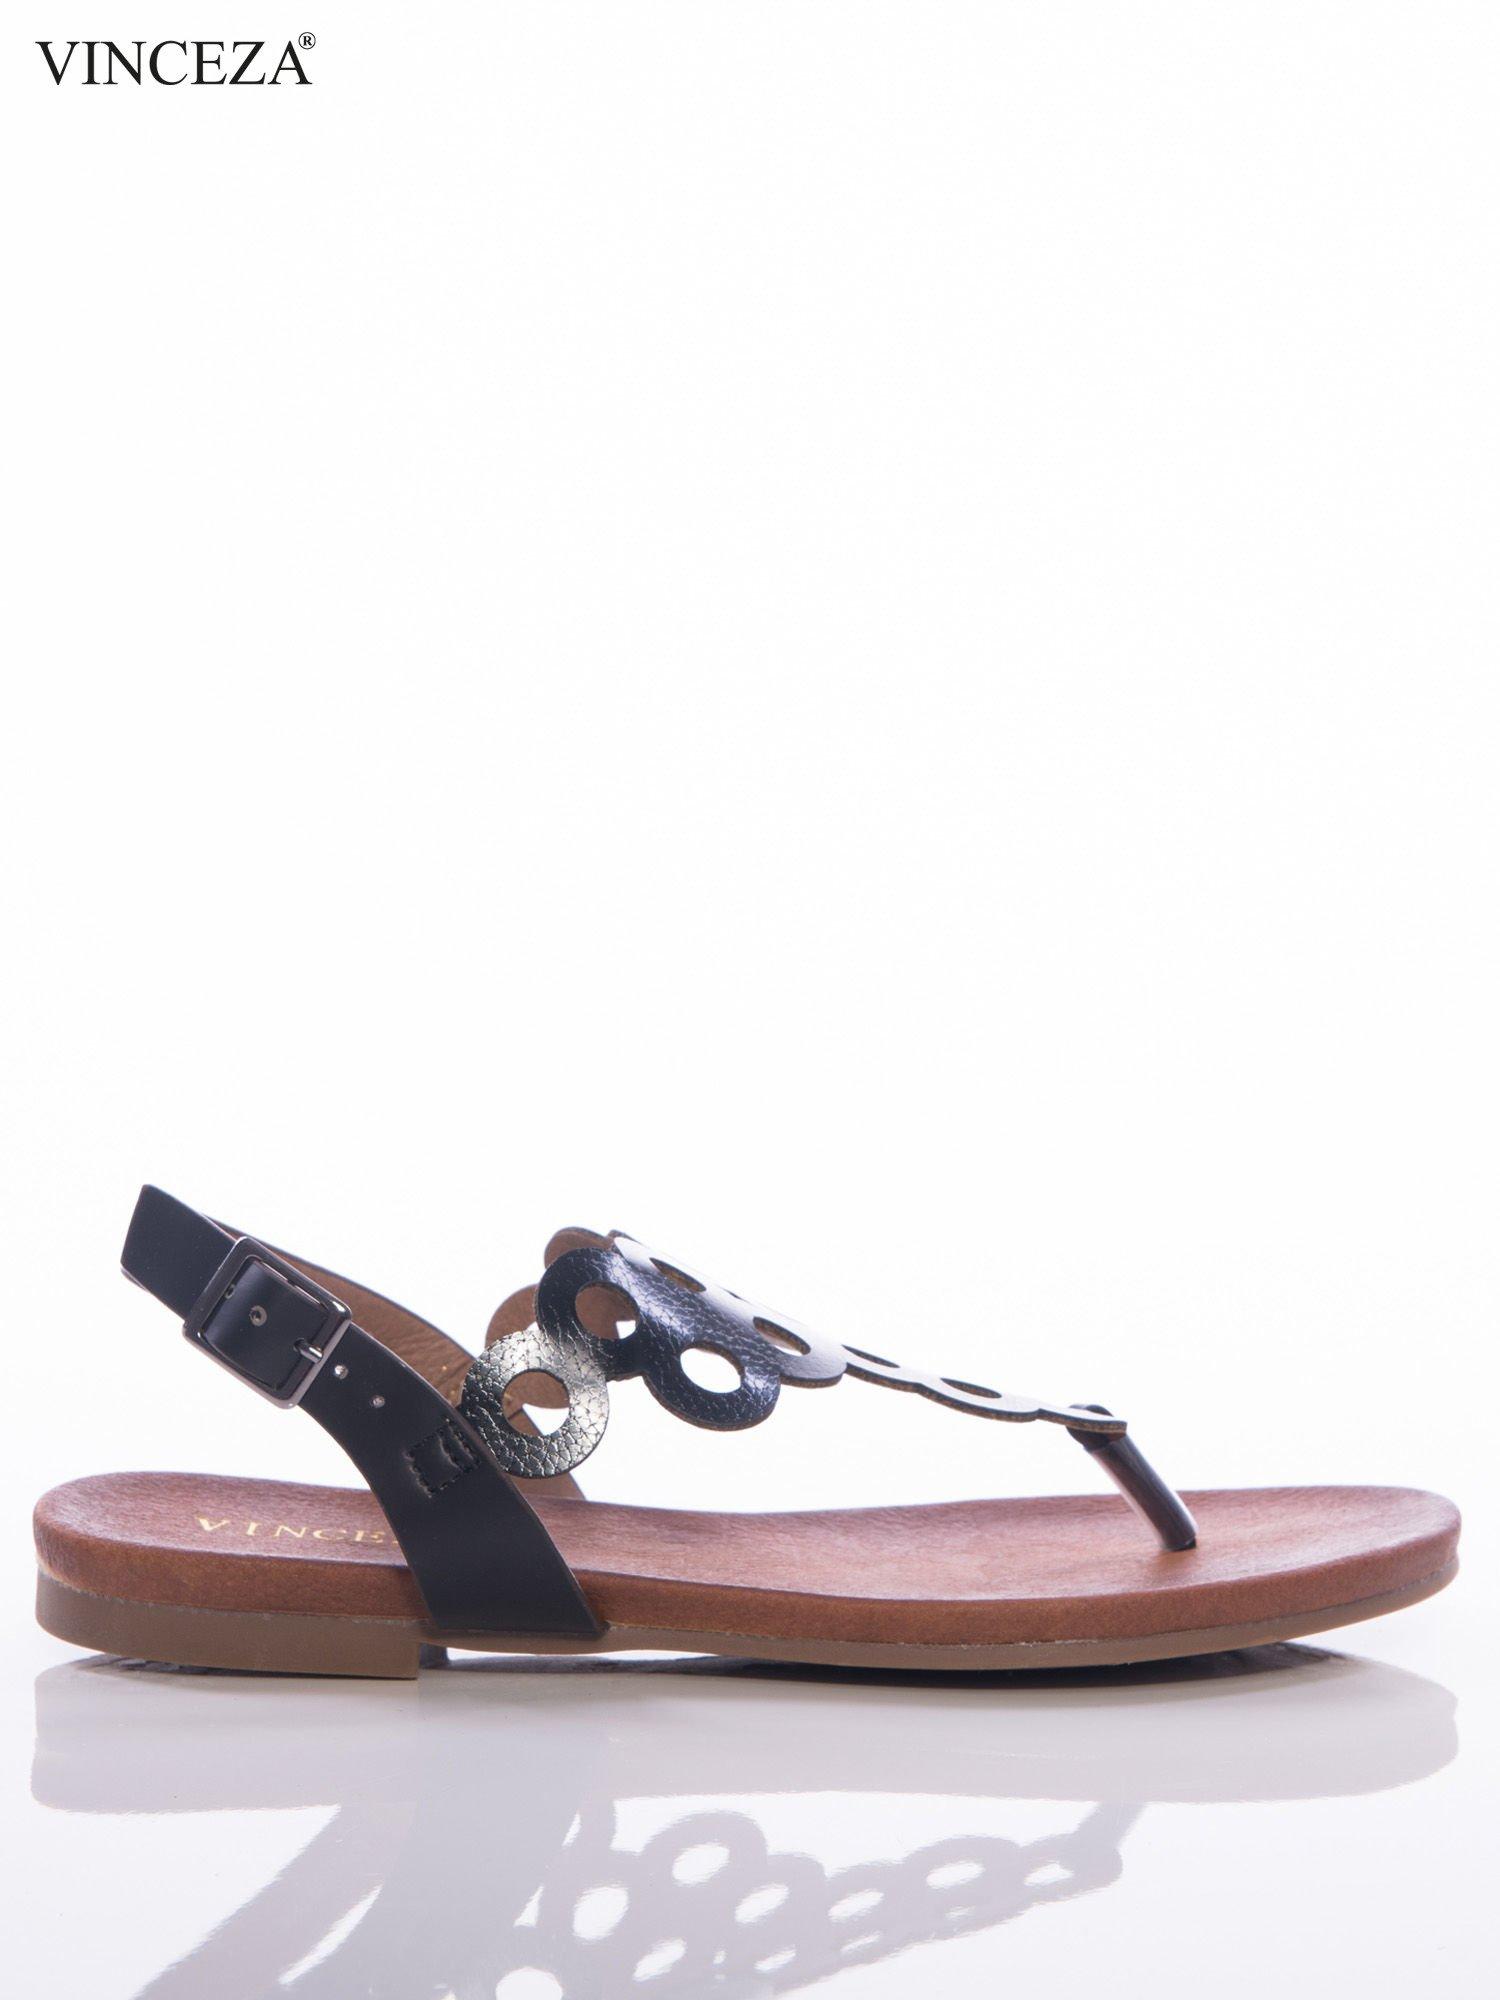 czarne sandały damskie z kółkami